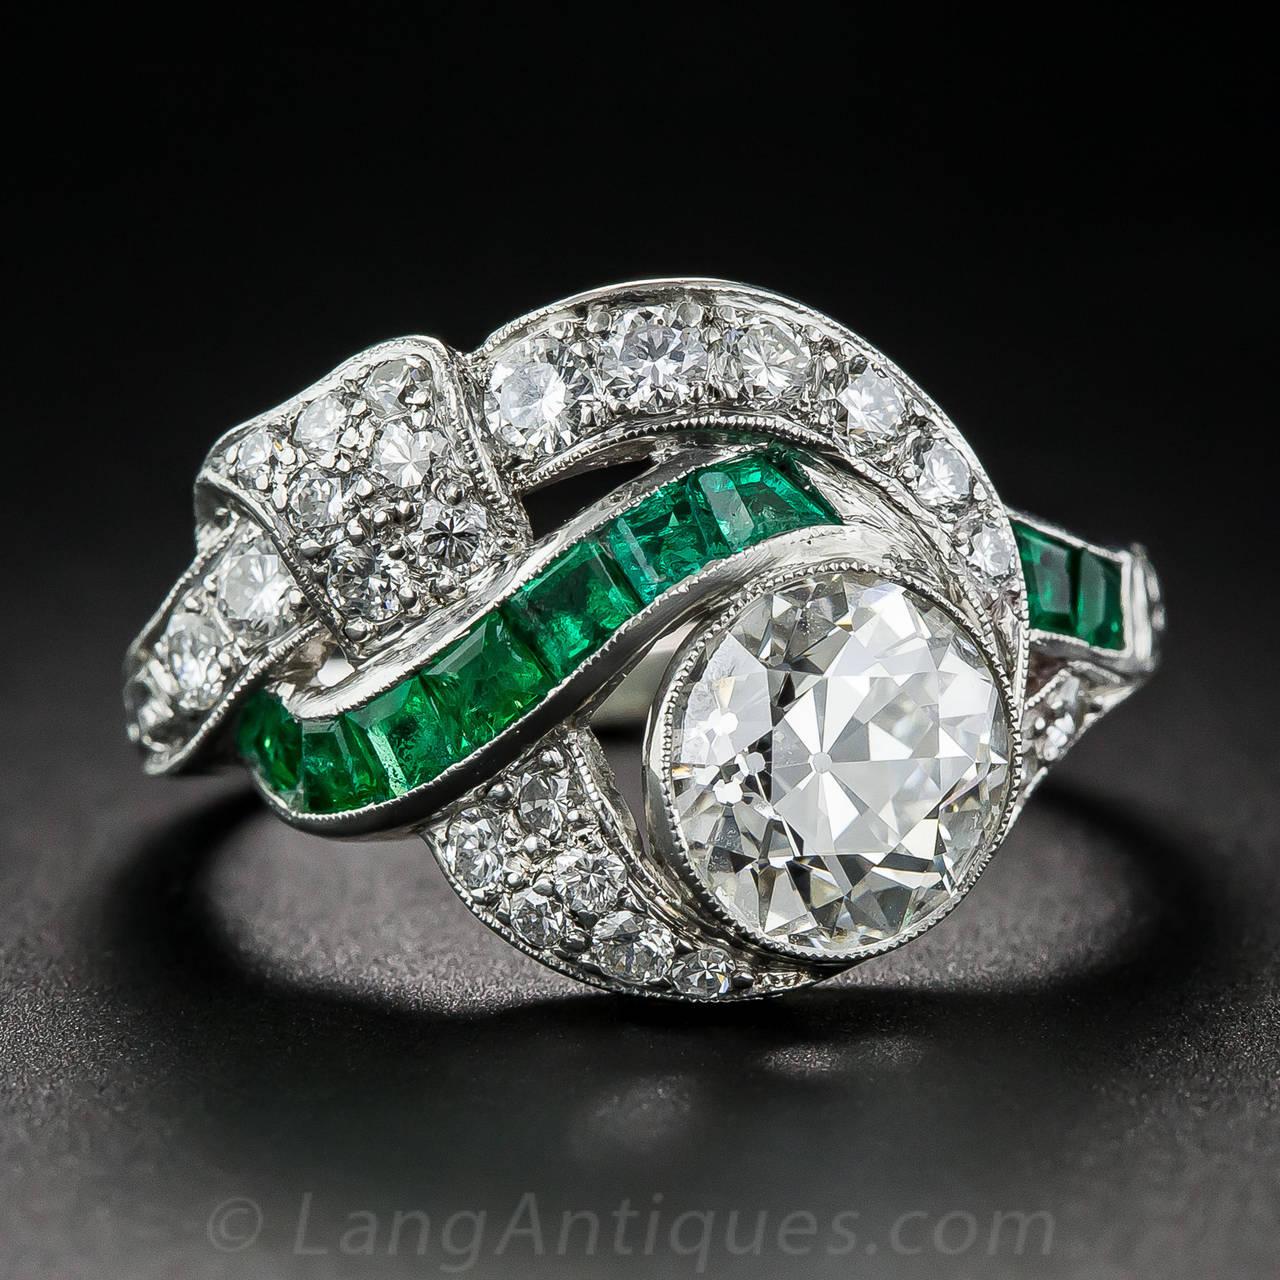 Art Deco 1.97 Carat Center Diamond and Emerald Ring 2